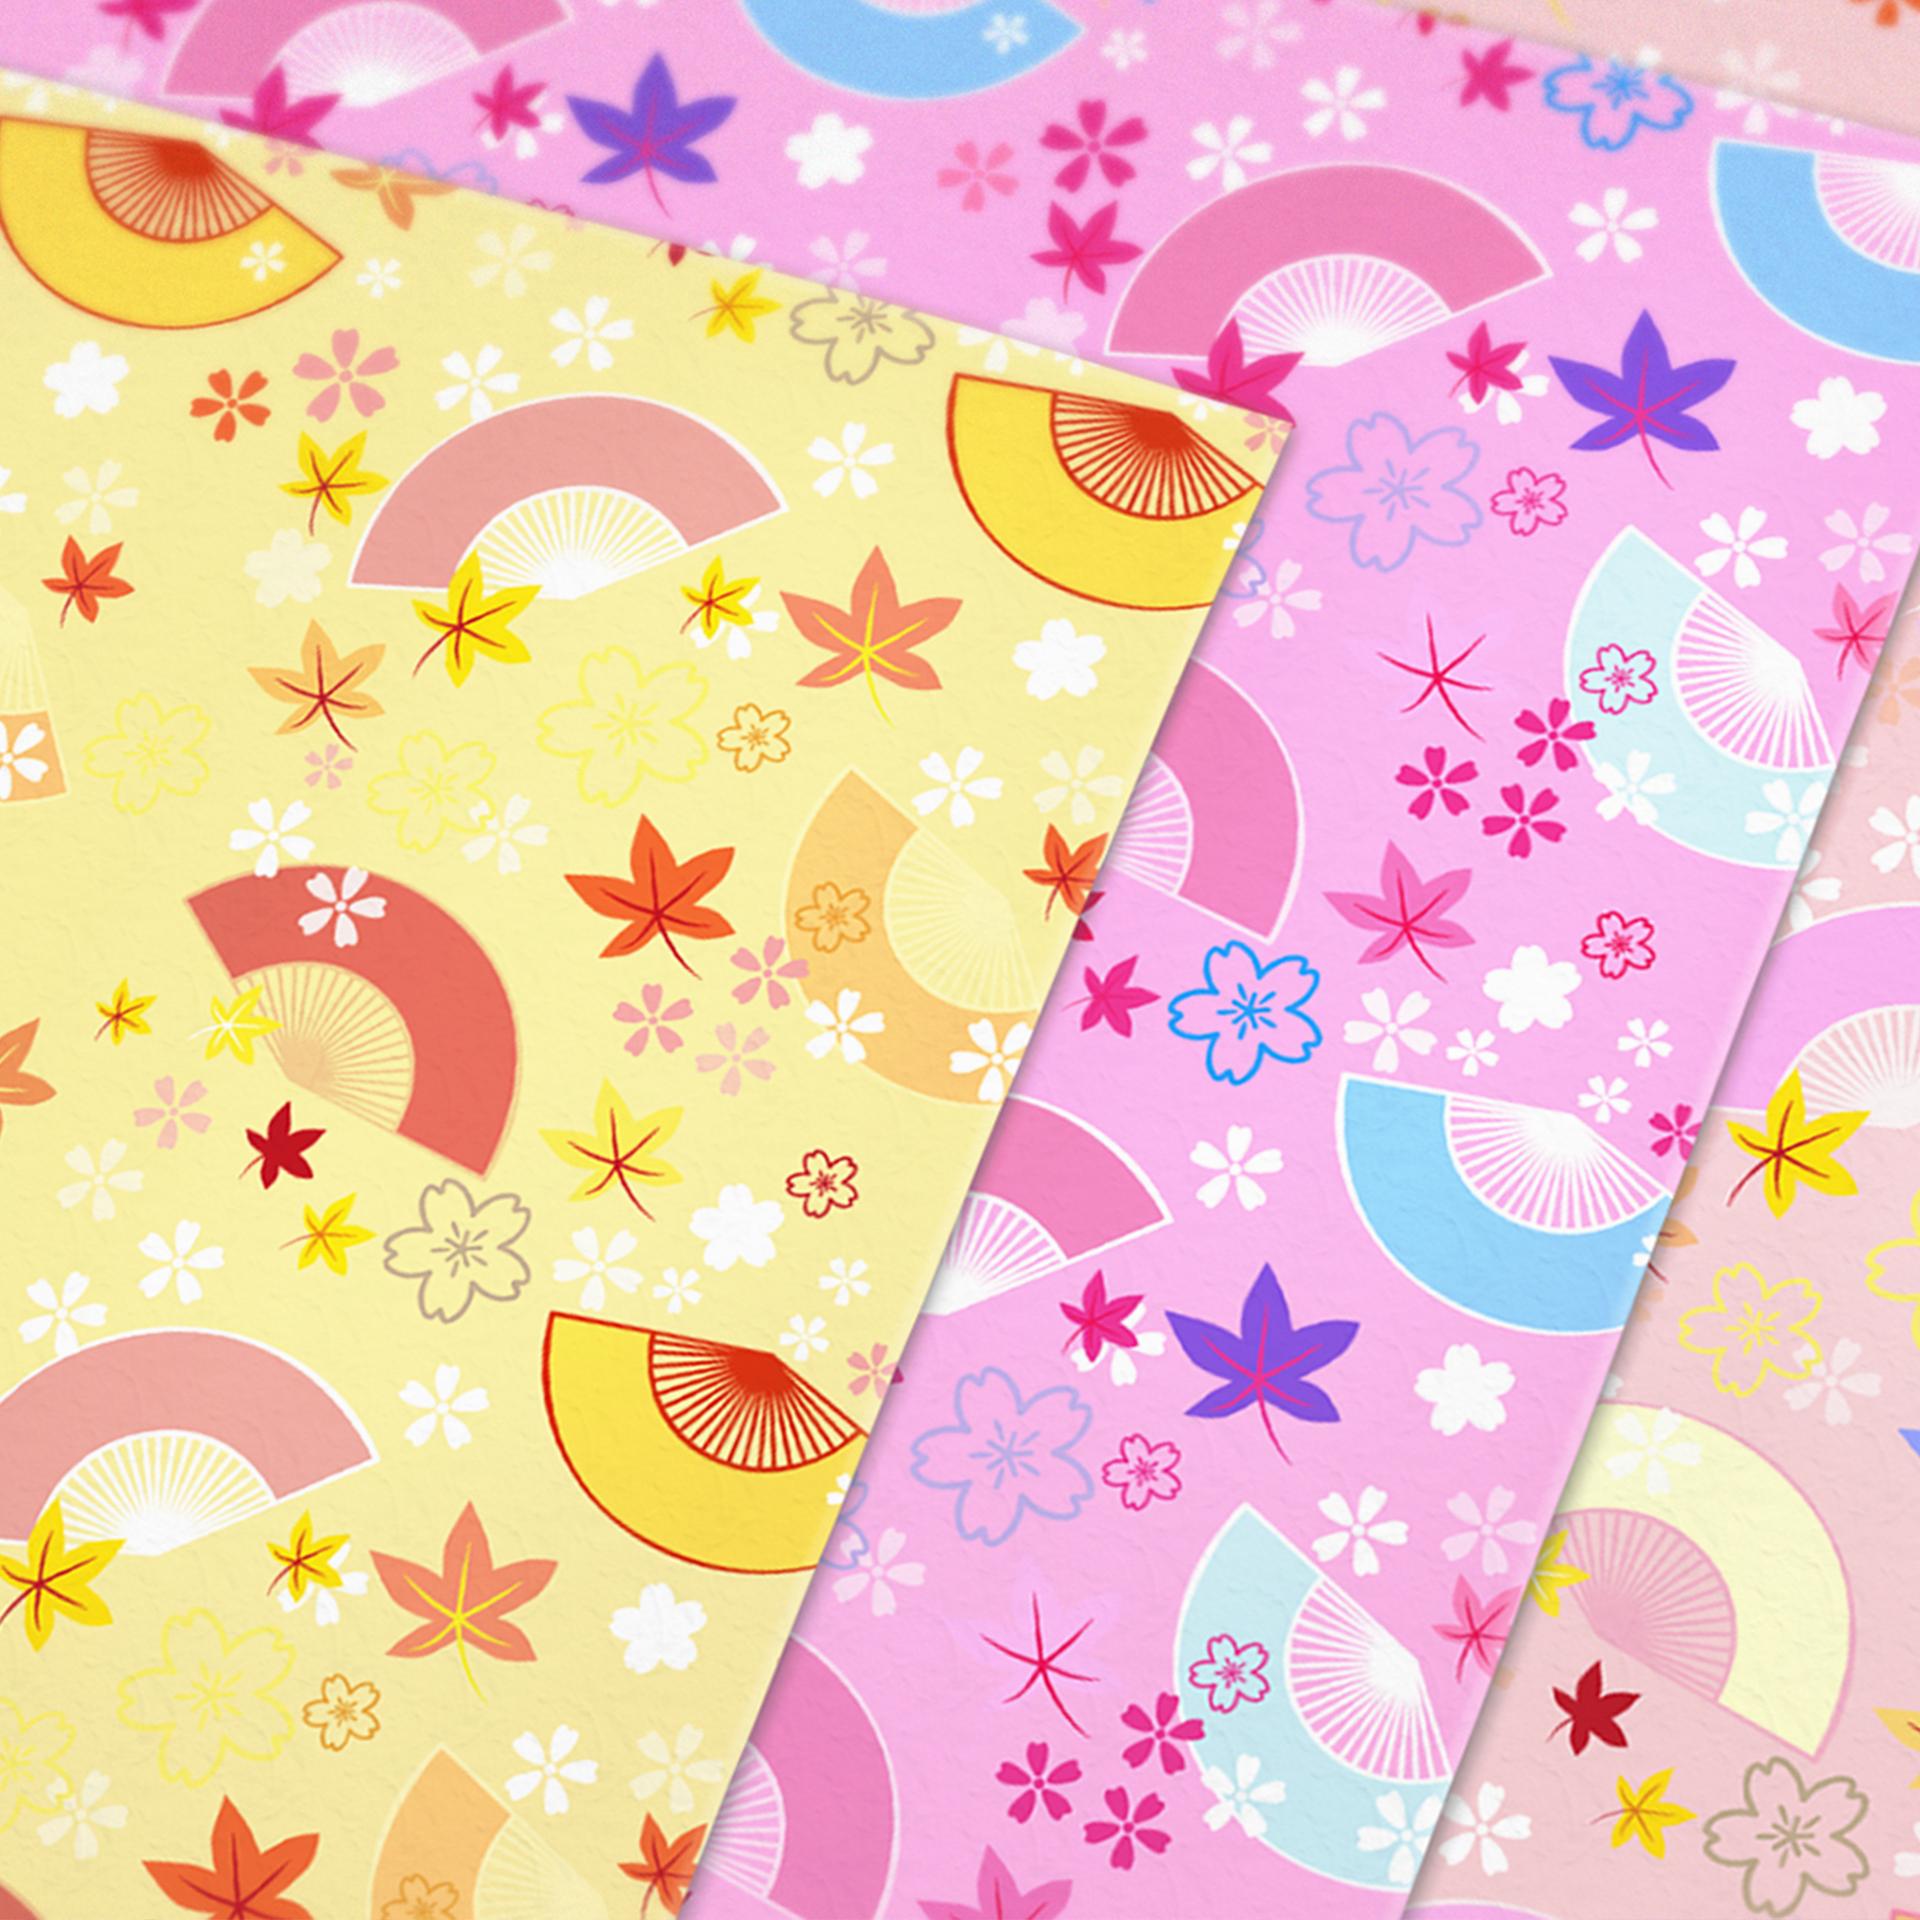 All Origami Paper - Paper Kawaii Shop - photo#36